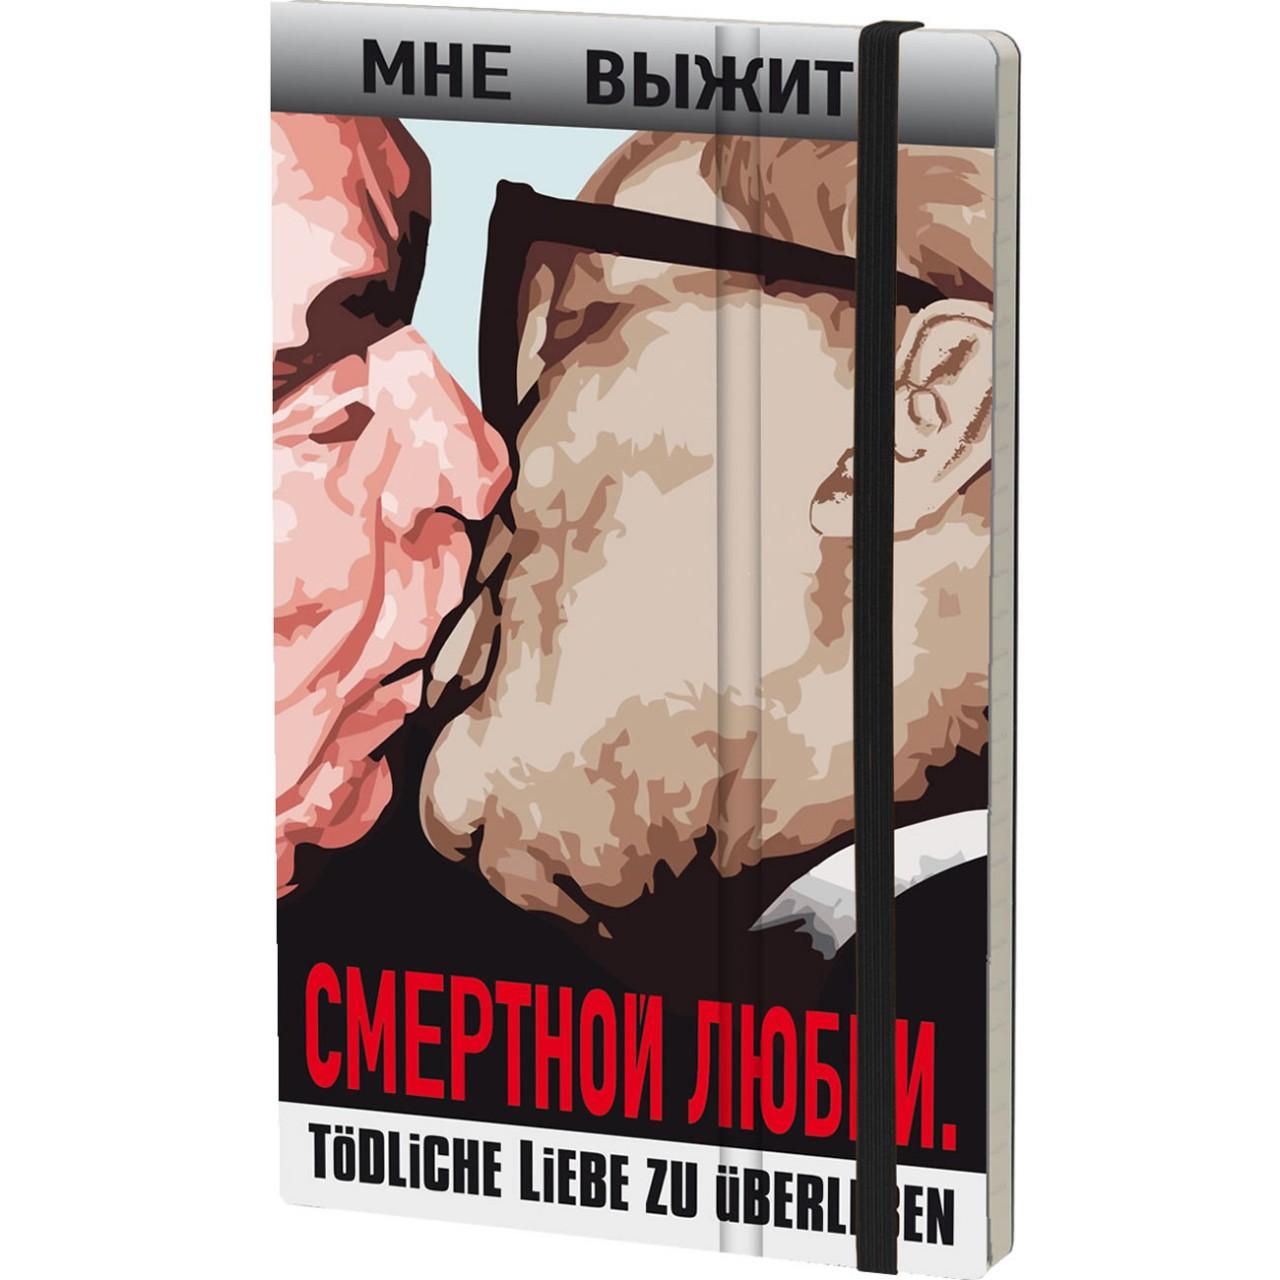 Stifflex Notizbuch THE WALL 13 x 21 cm 192 S.,  FRATERNAL KISS - ORIGINAL